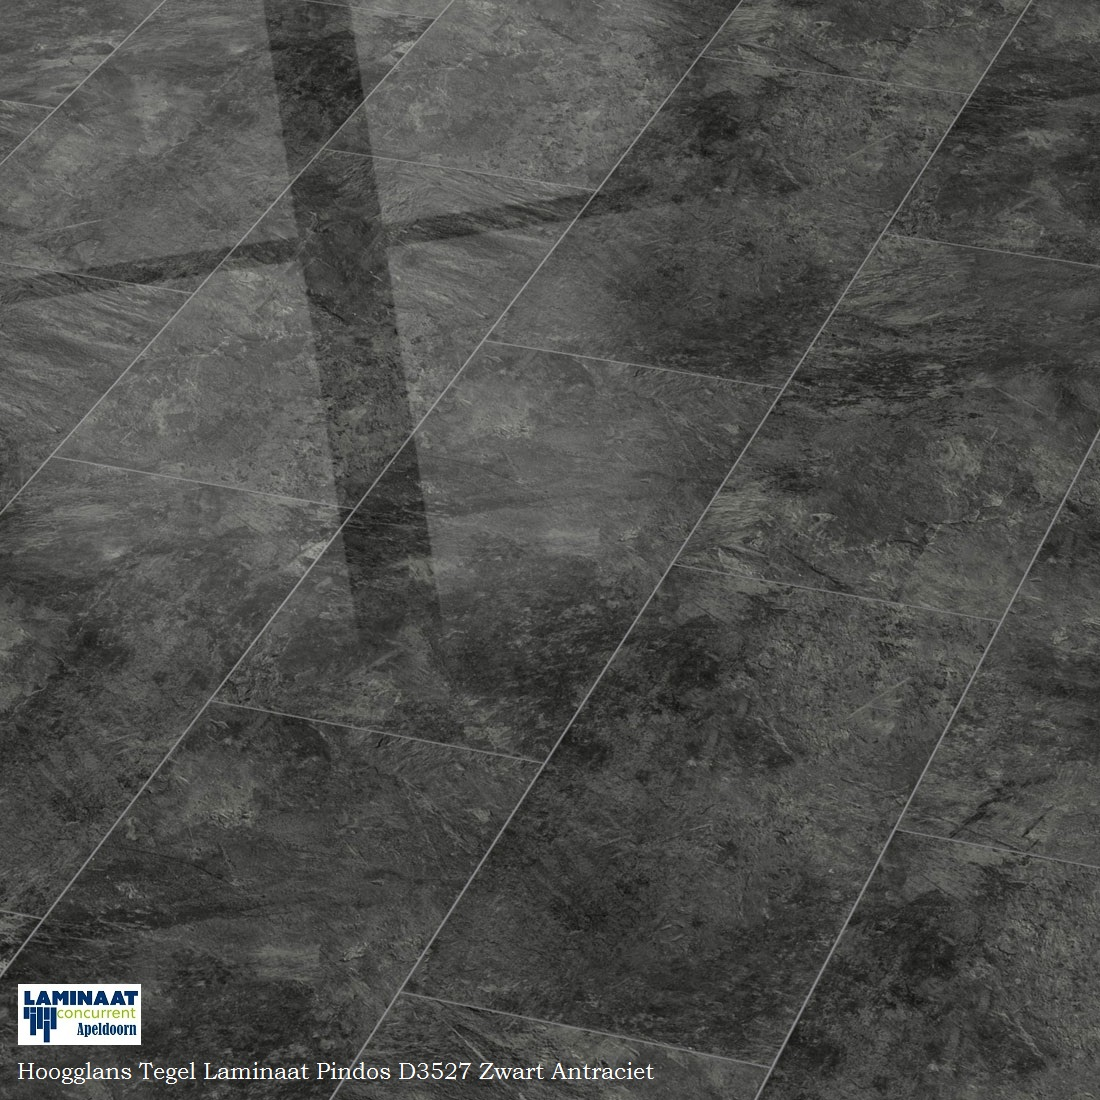 hoogglans tegel laminaat grijs Pindos D3527 0